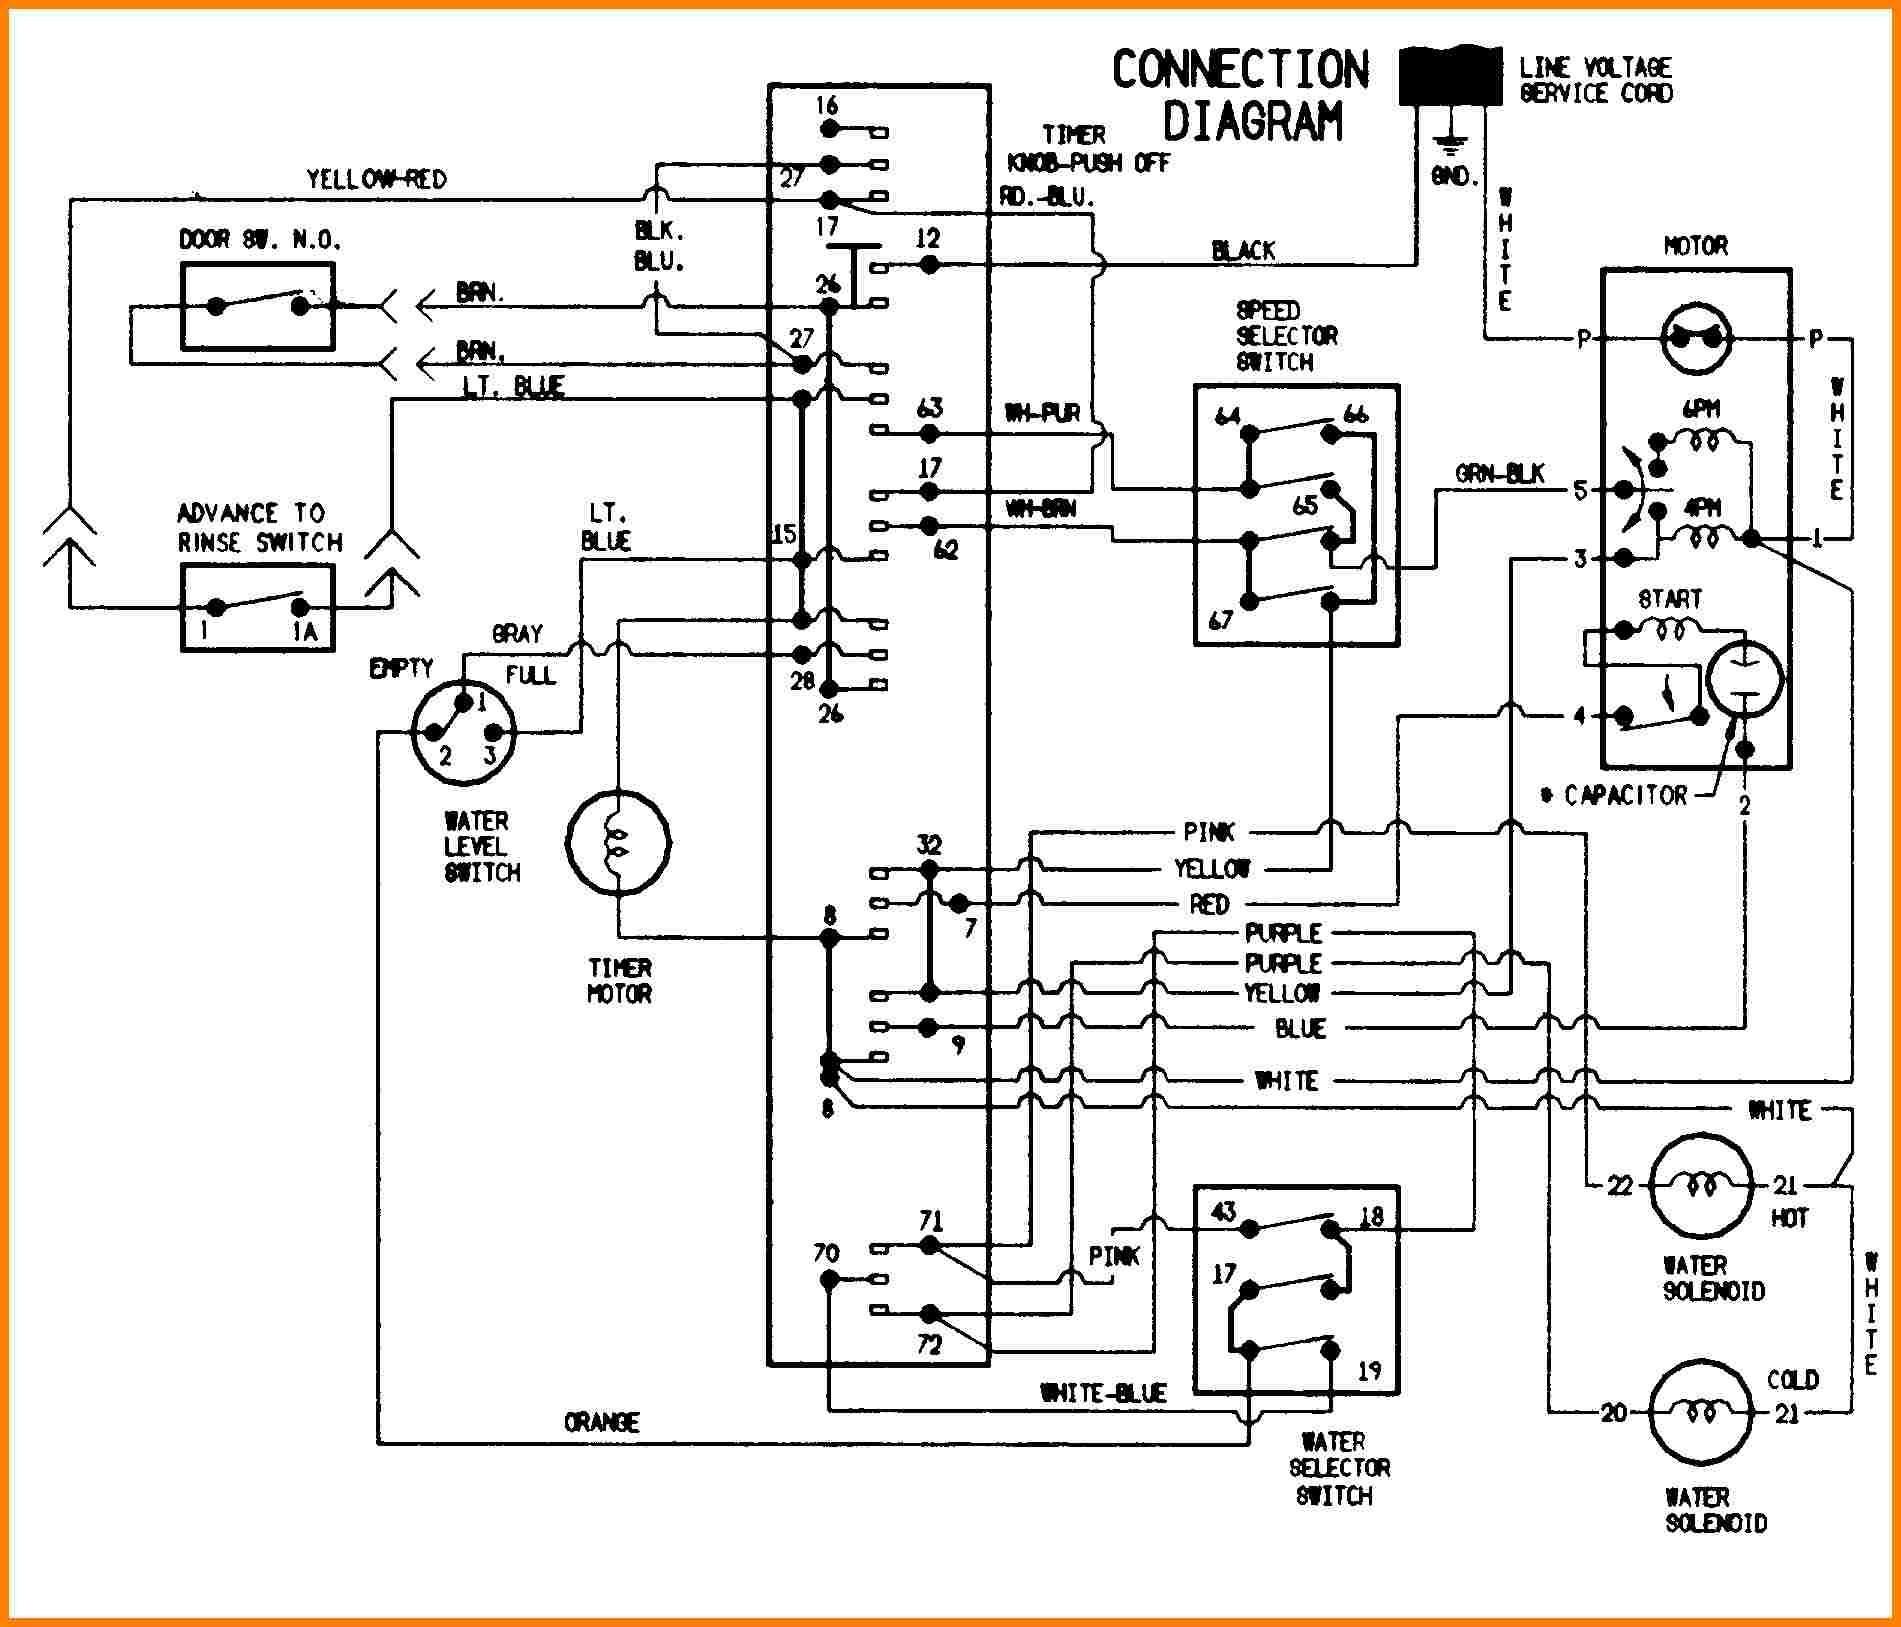 Whirlpool Washing Machine Wiring Diagram